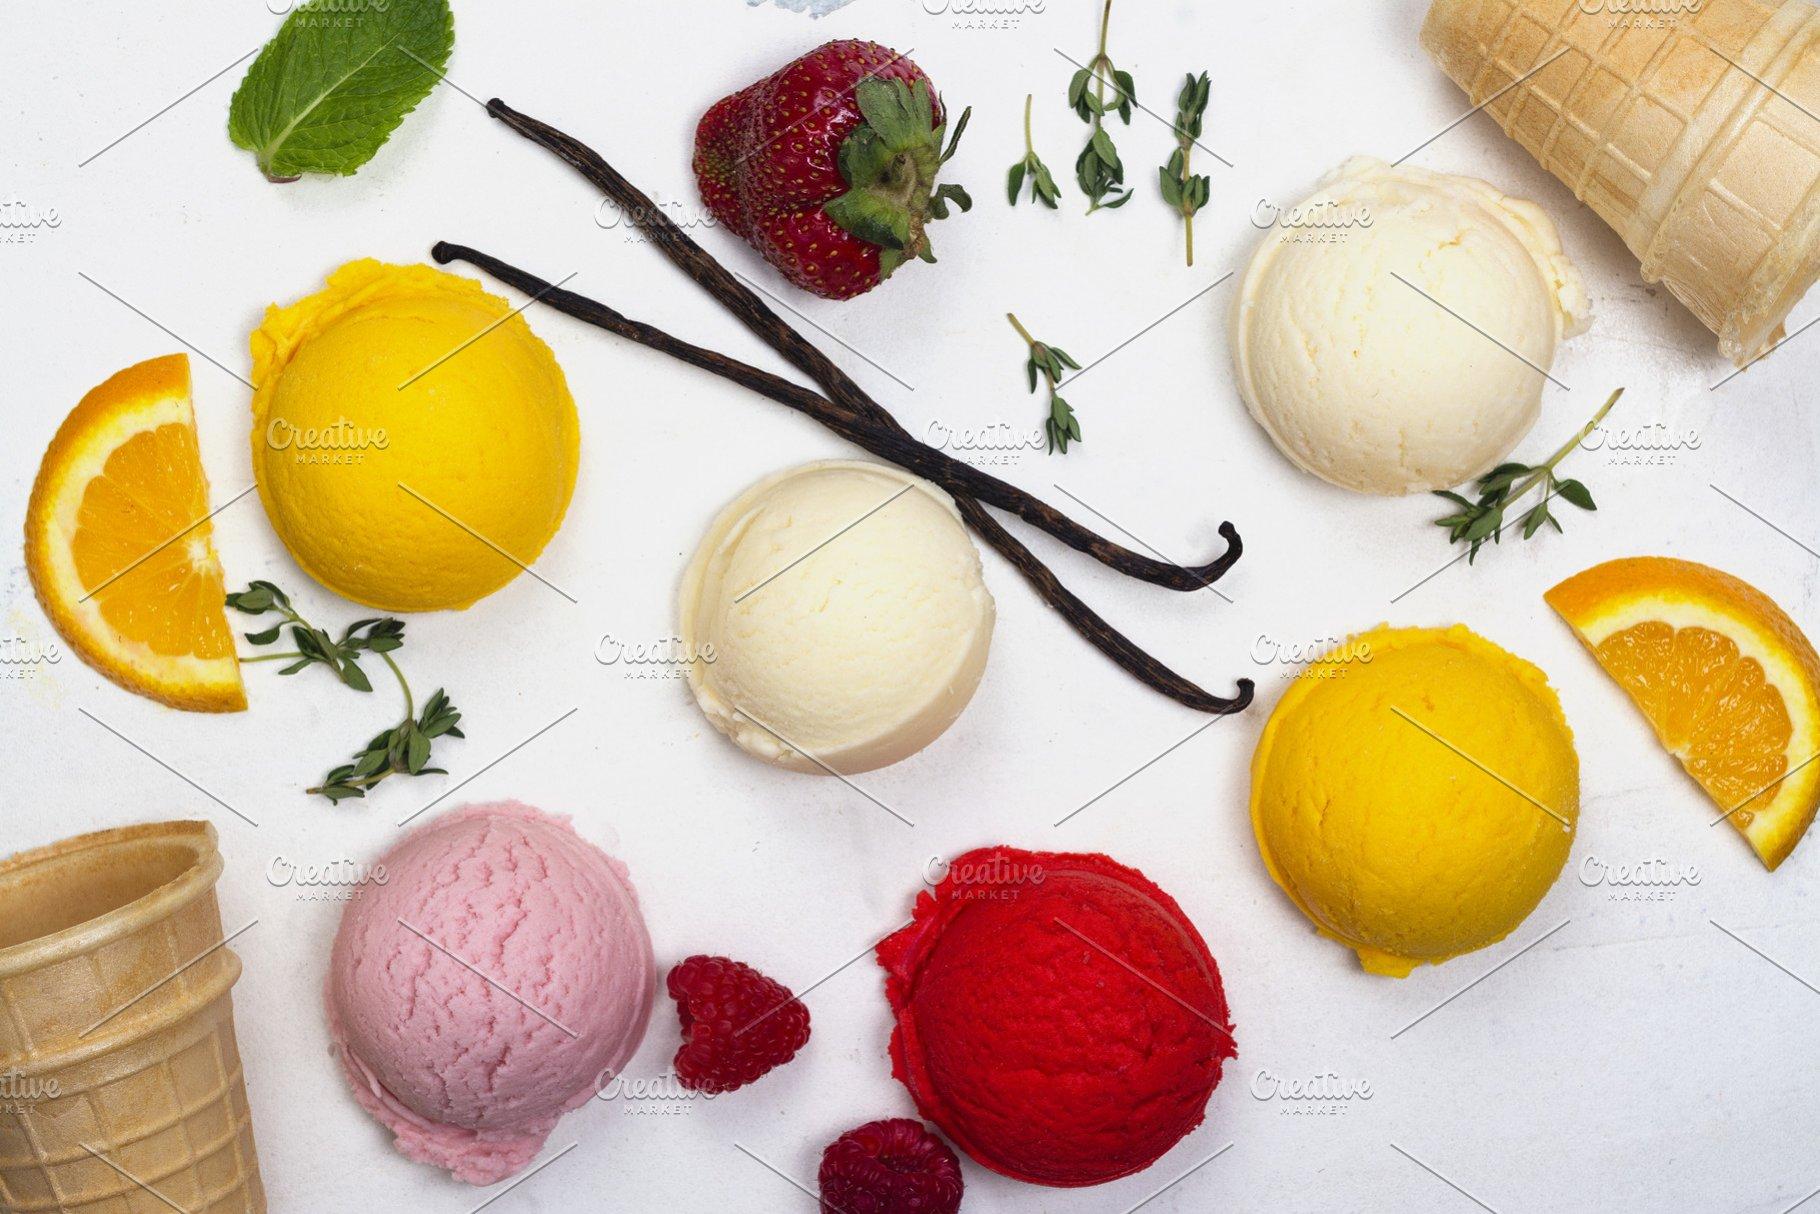 Orange Vanilla Raspberry And Strawberry Ice Cream Scoops On White Background